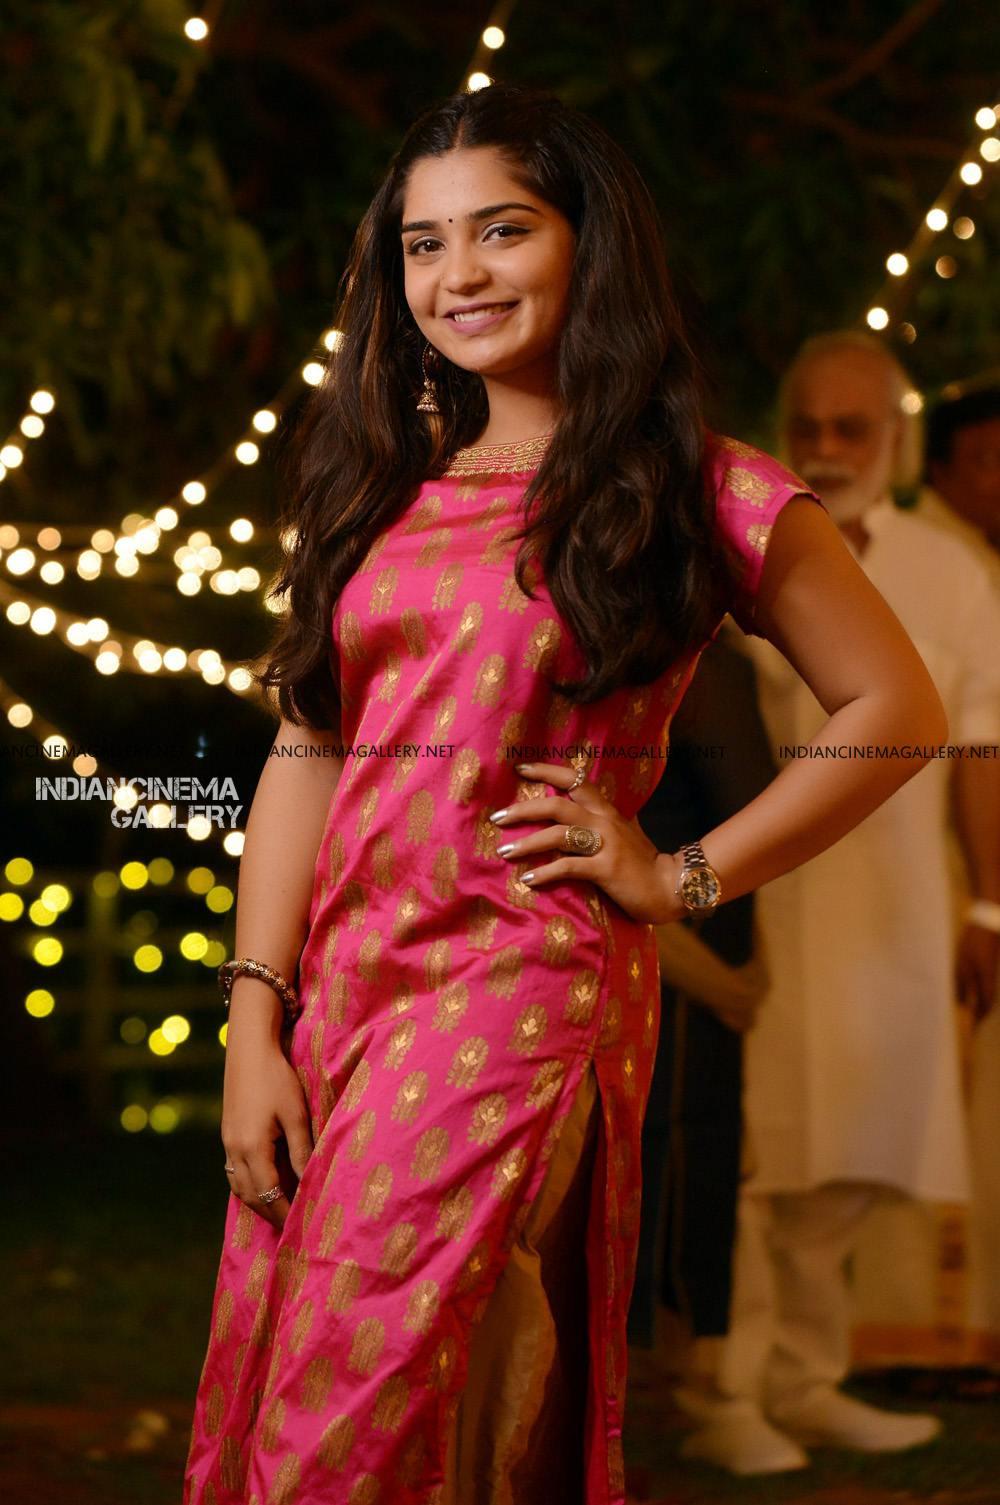 Gouri G Kishan at sunny wayne wedding reception (6)